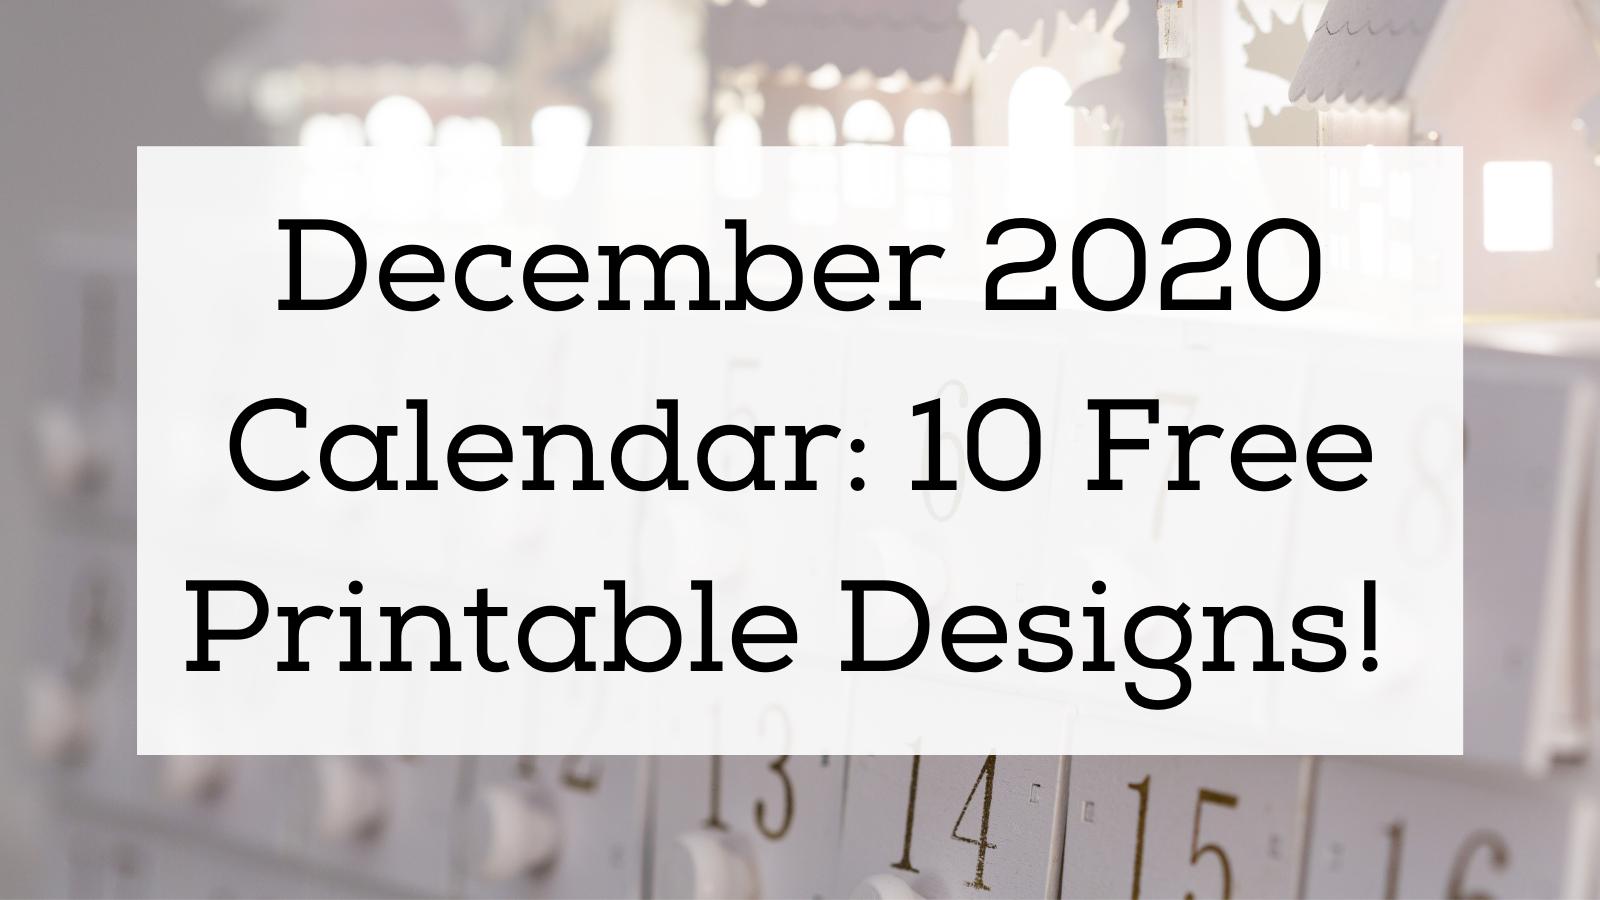 December 2020 calendar: 10 free printable designs!